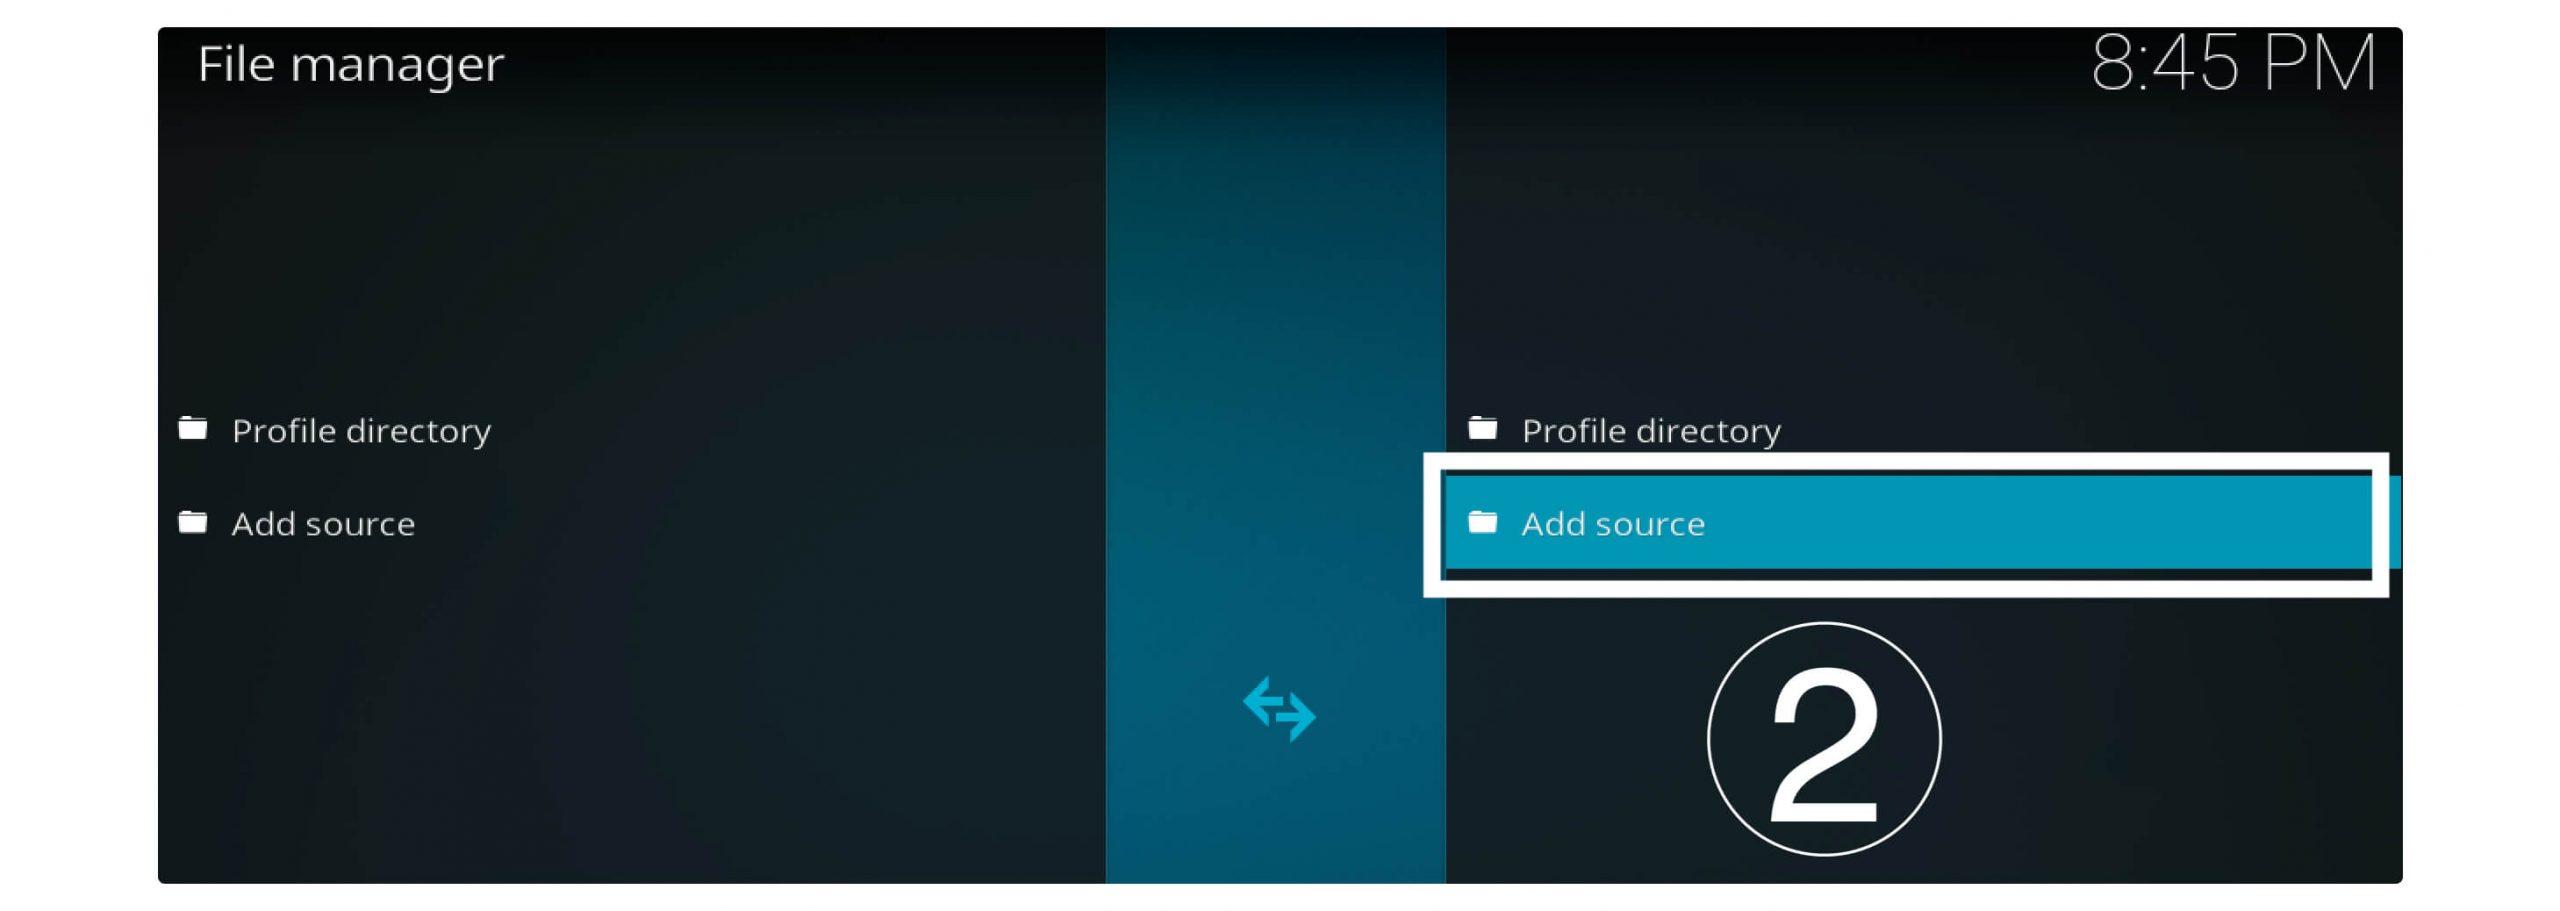 How-To-Install-SportsDevil-On-Kodi-In-Firestick